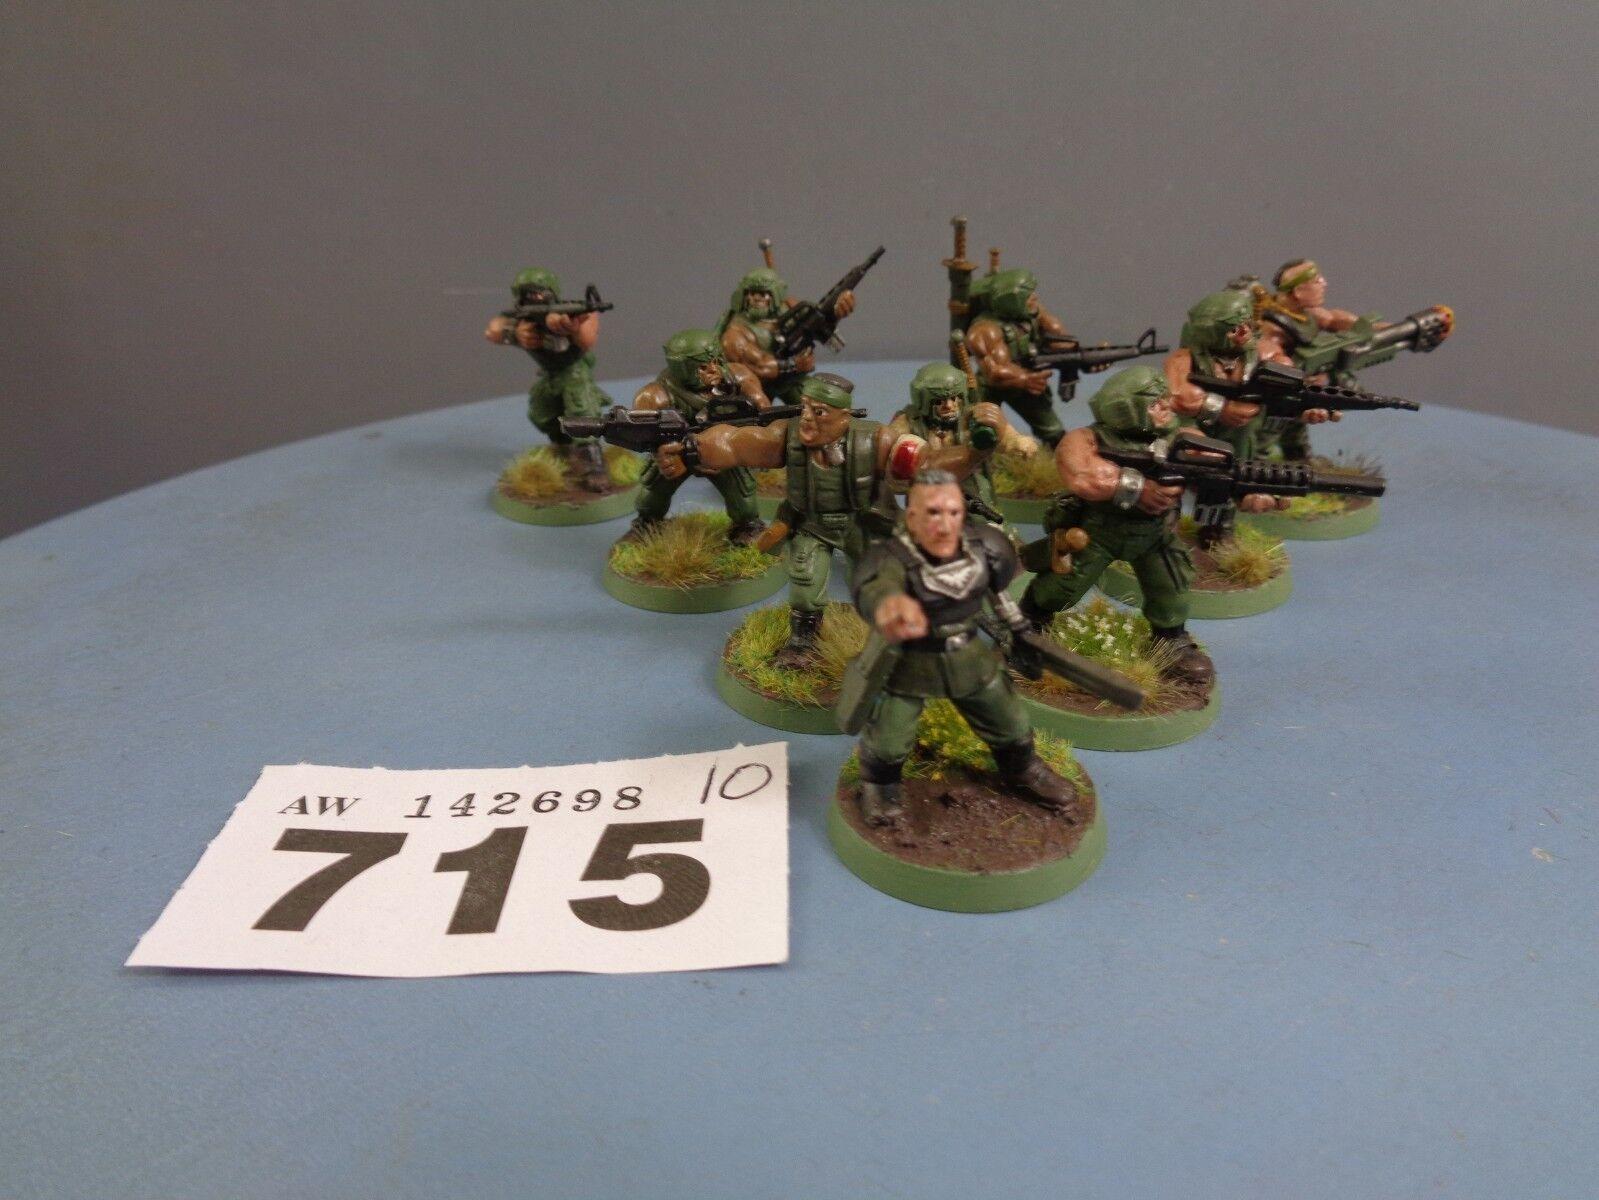 Warhammer Astra Militarum Imperial Guard Catachan Cadian Vet Guardsmen Squad 715